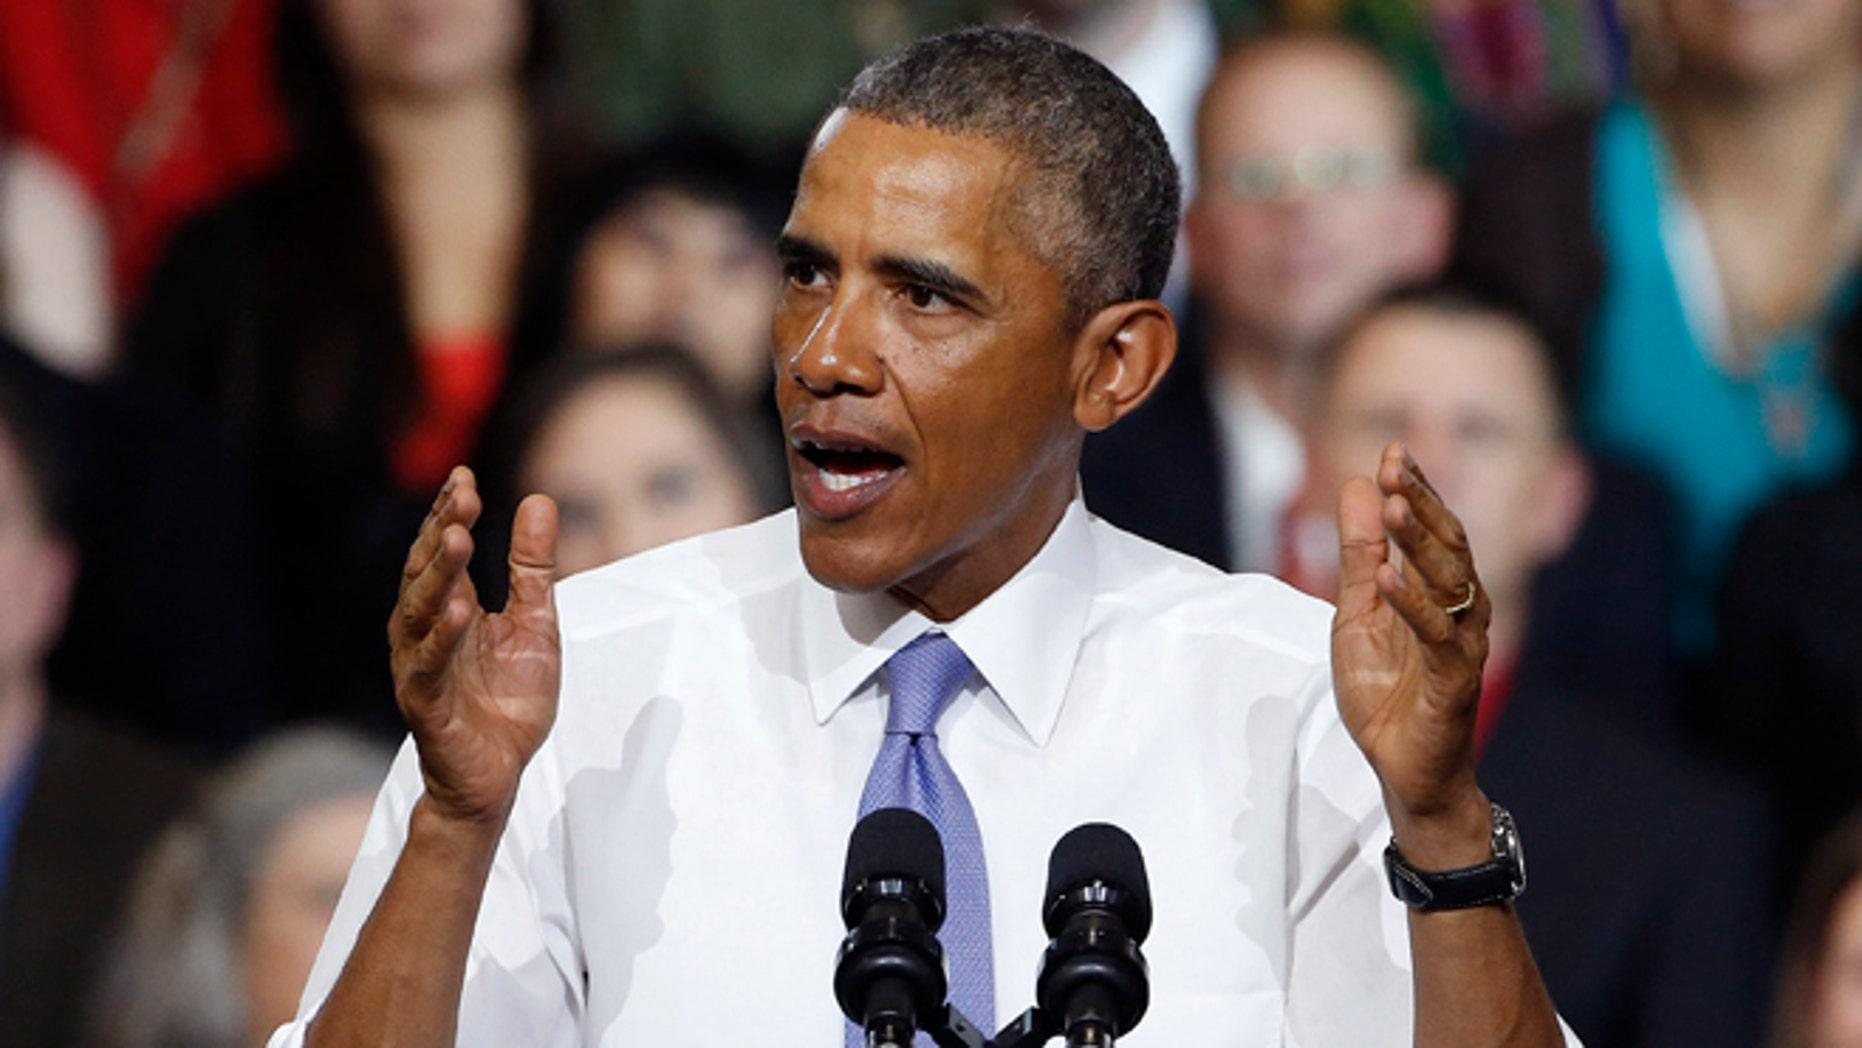 Thursday, Jan. 8, 2015 photo of President Barack Obama in Phoenix.